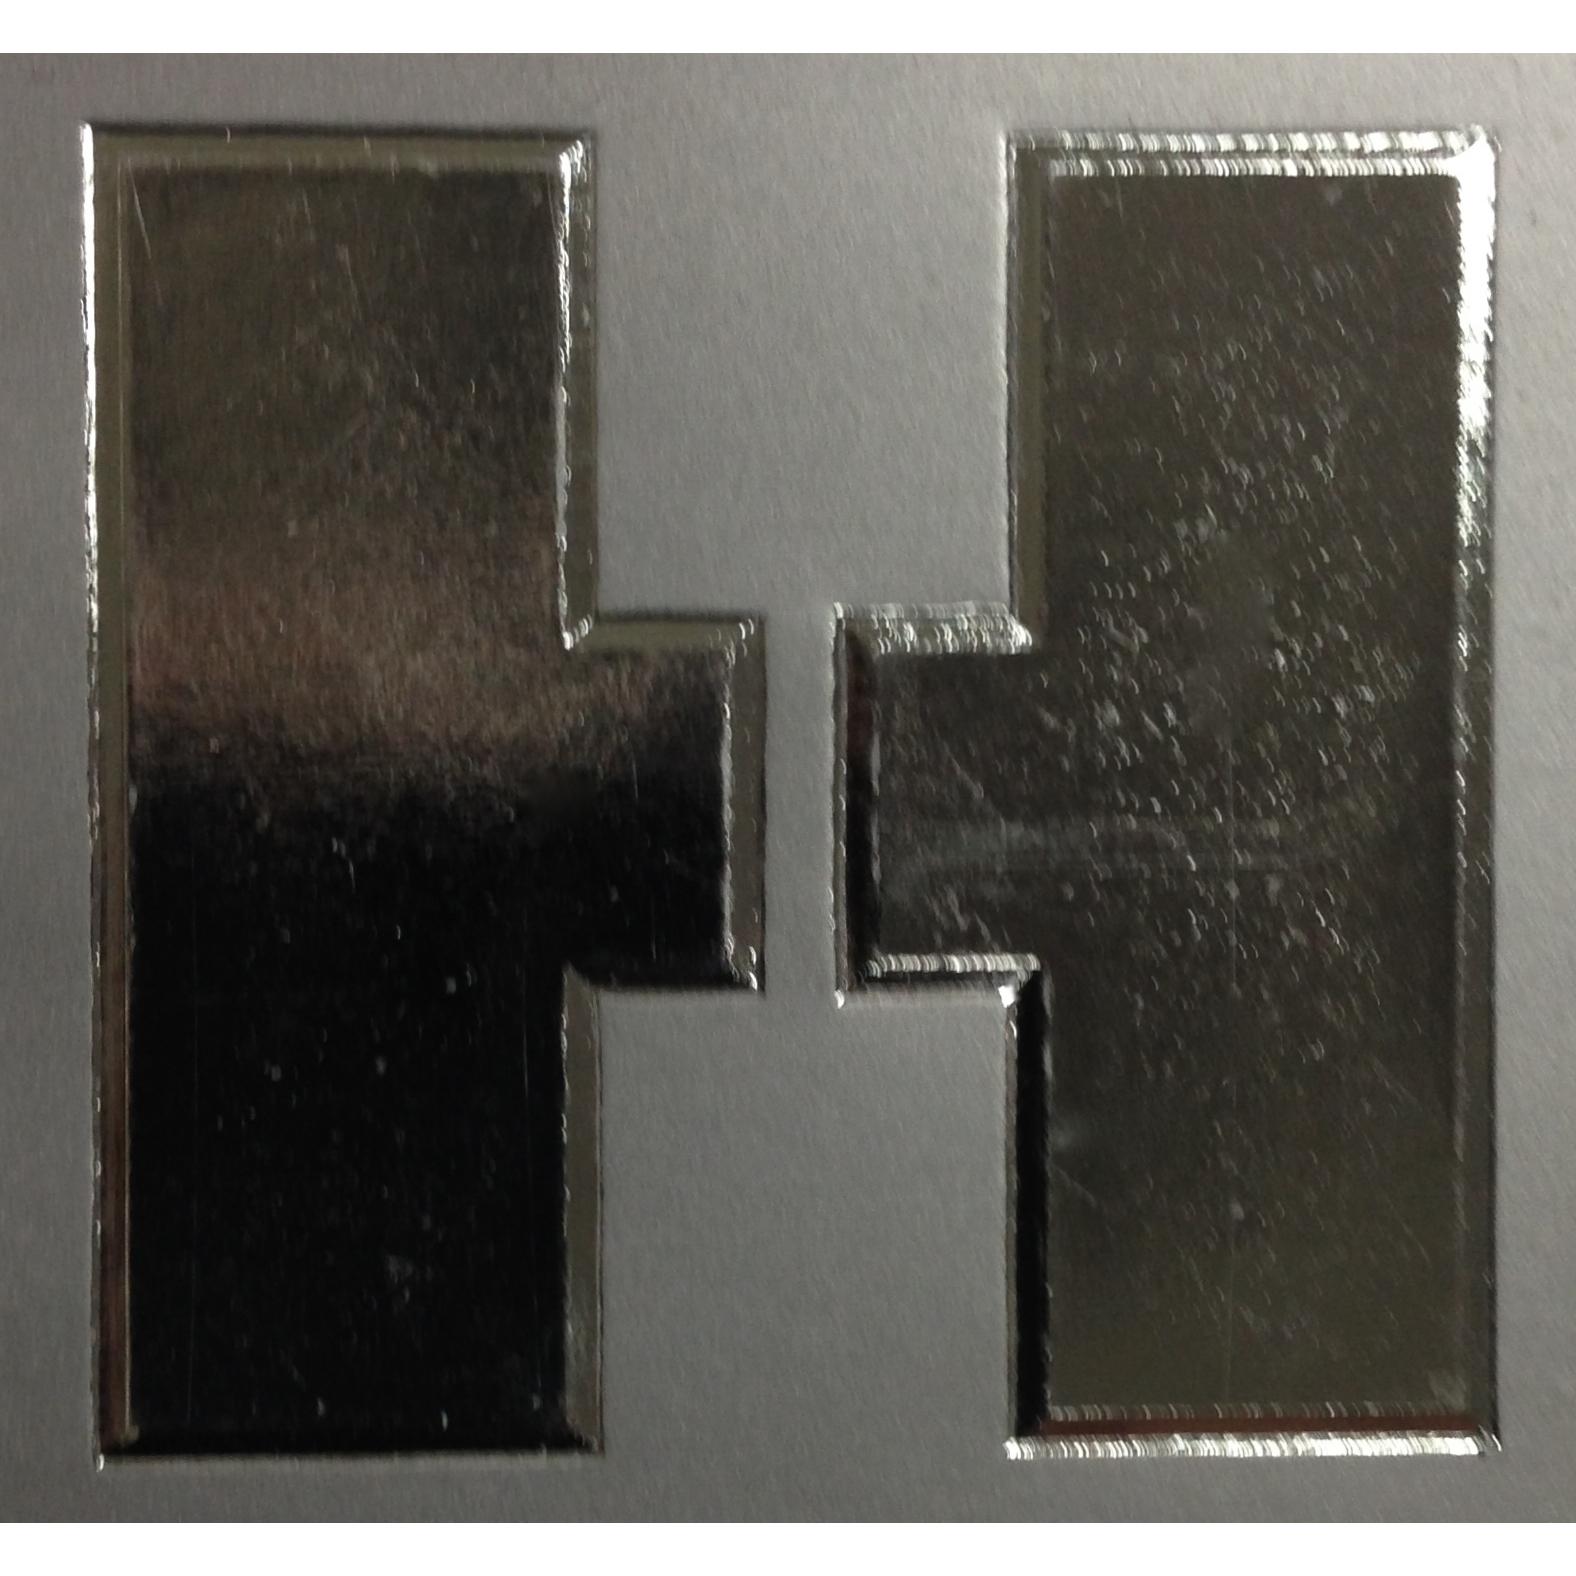 Hicks Brothers Printing Equipment, LLC